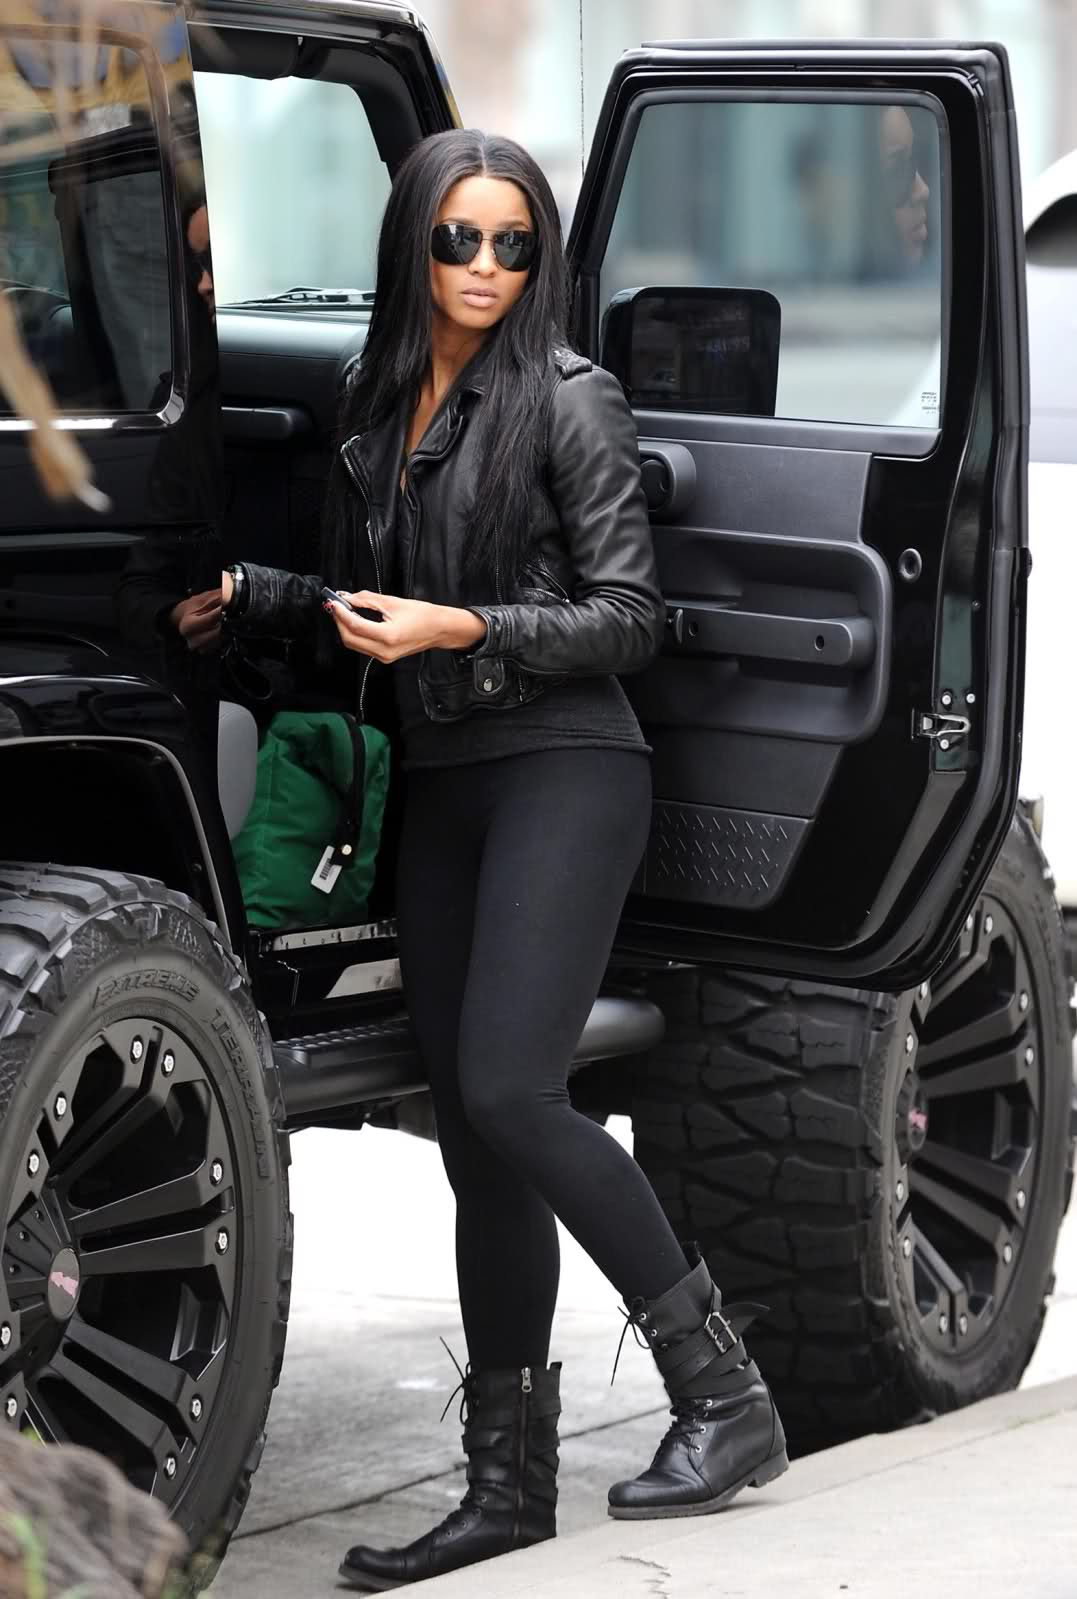 Jeep Wrangler Ciara Ridin Girls